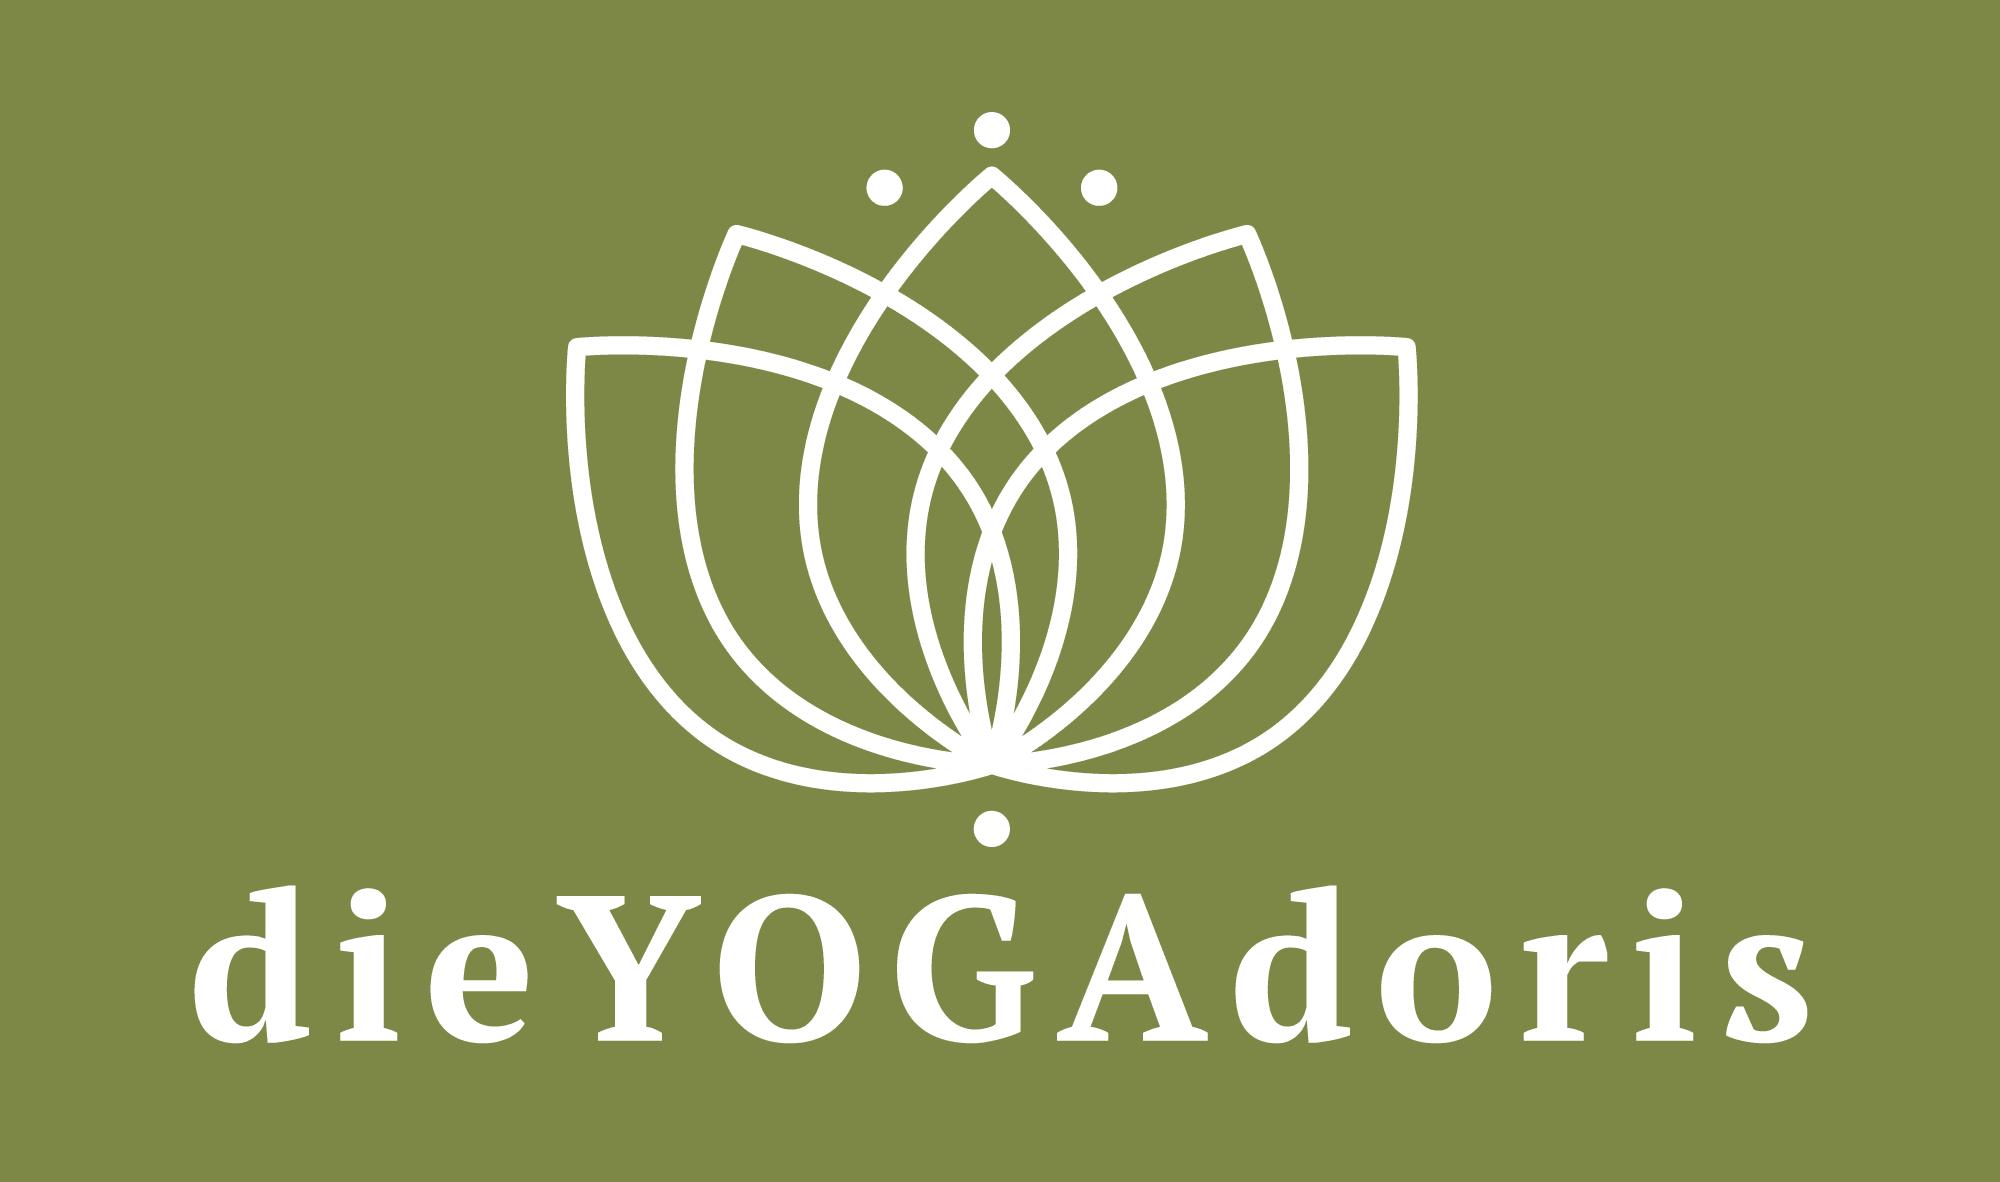 dieYOGAdoris logo